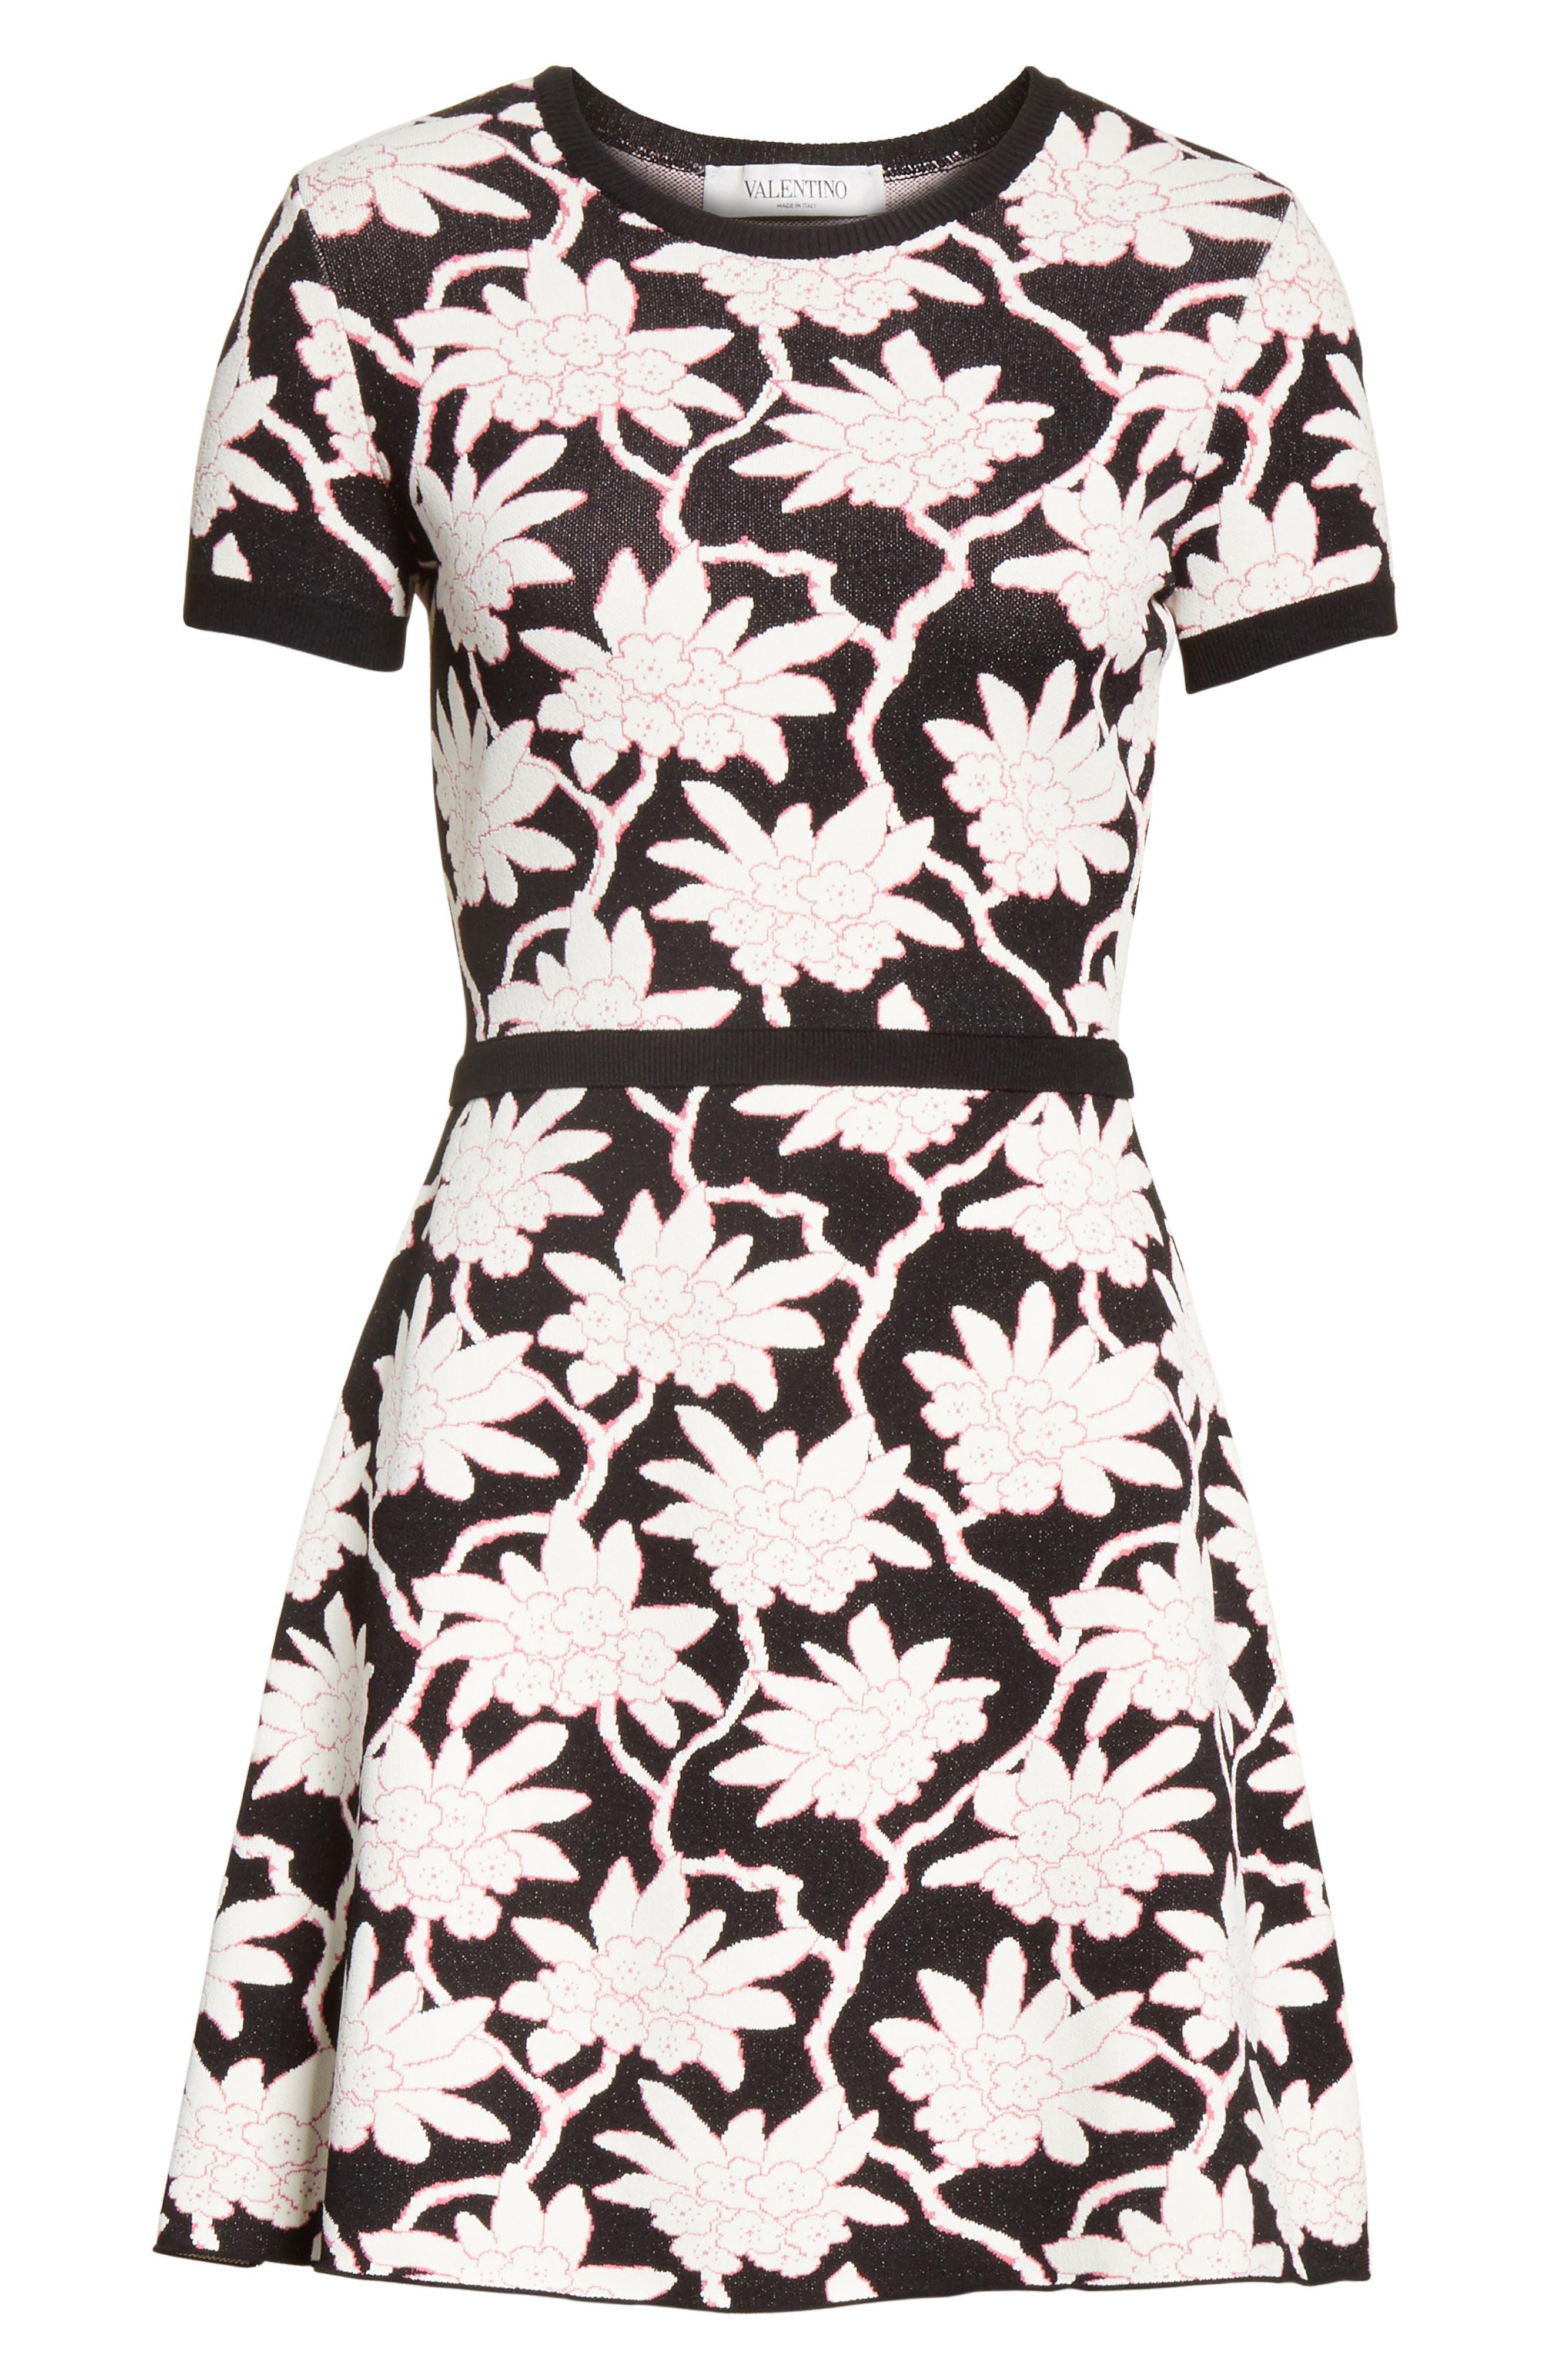 Rhododendron Jacquard Dress,                             Alternate thumbnail 6, color,                             001